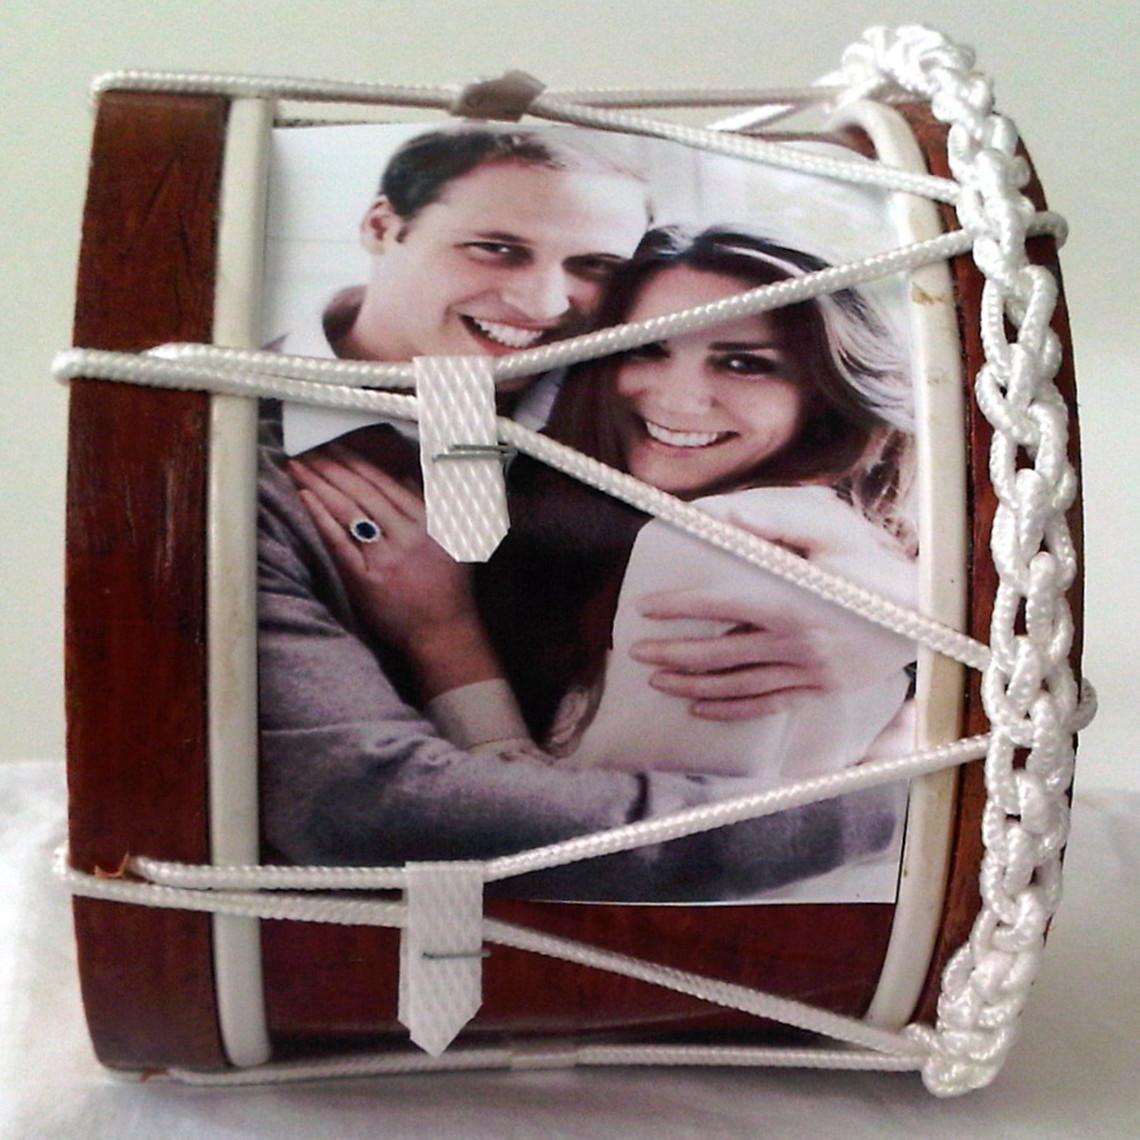 Royal Wedding Mini Lambeg Drum